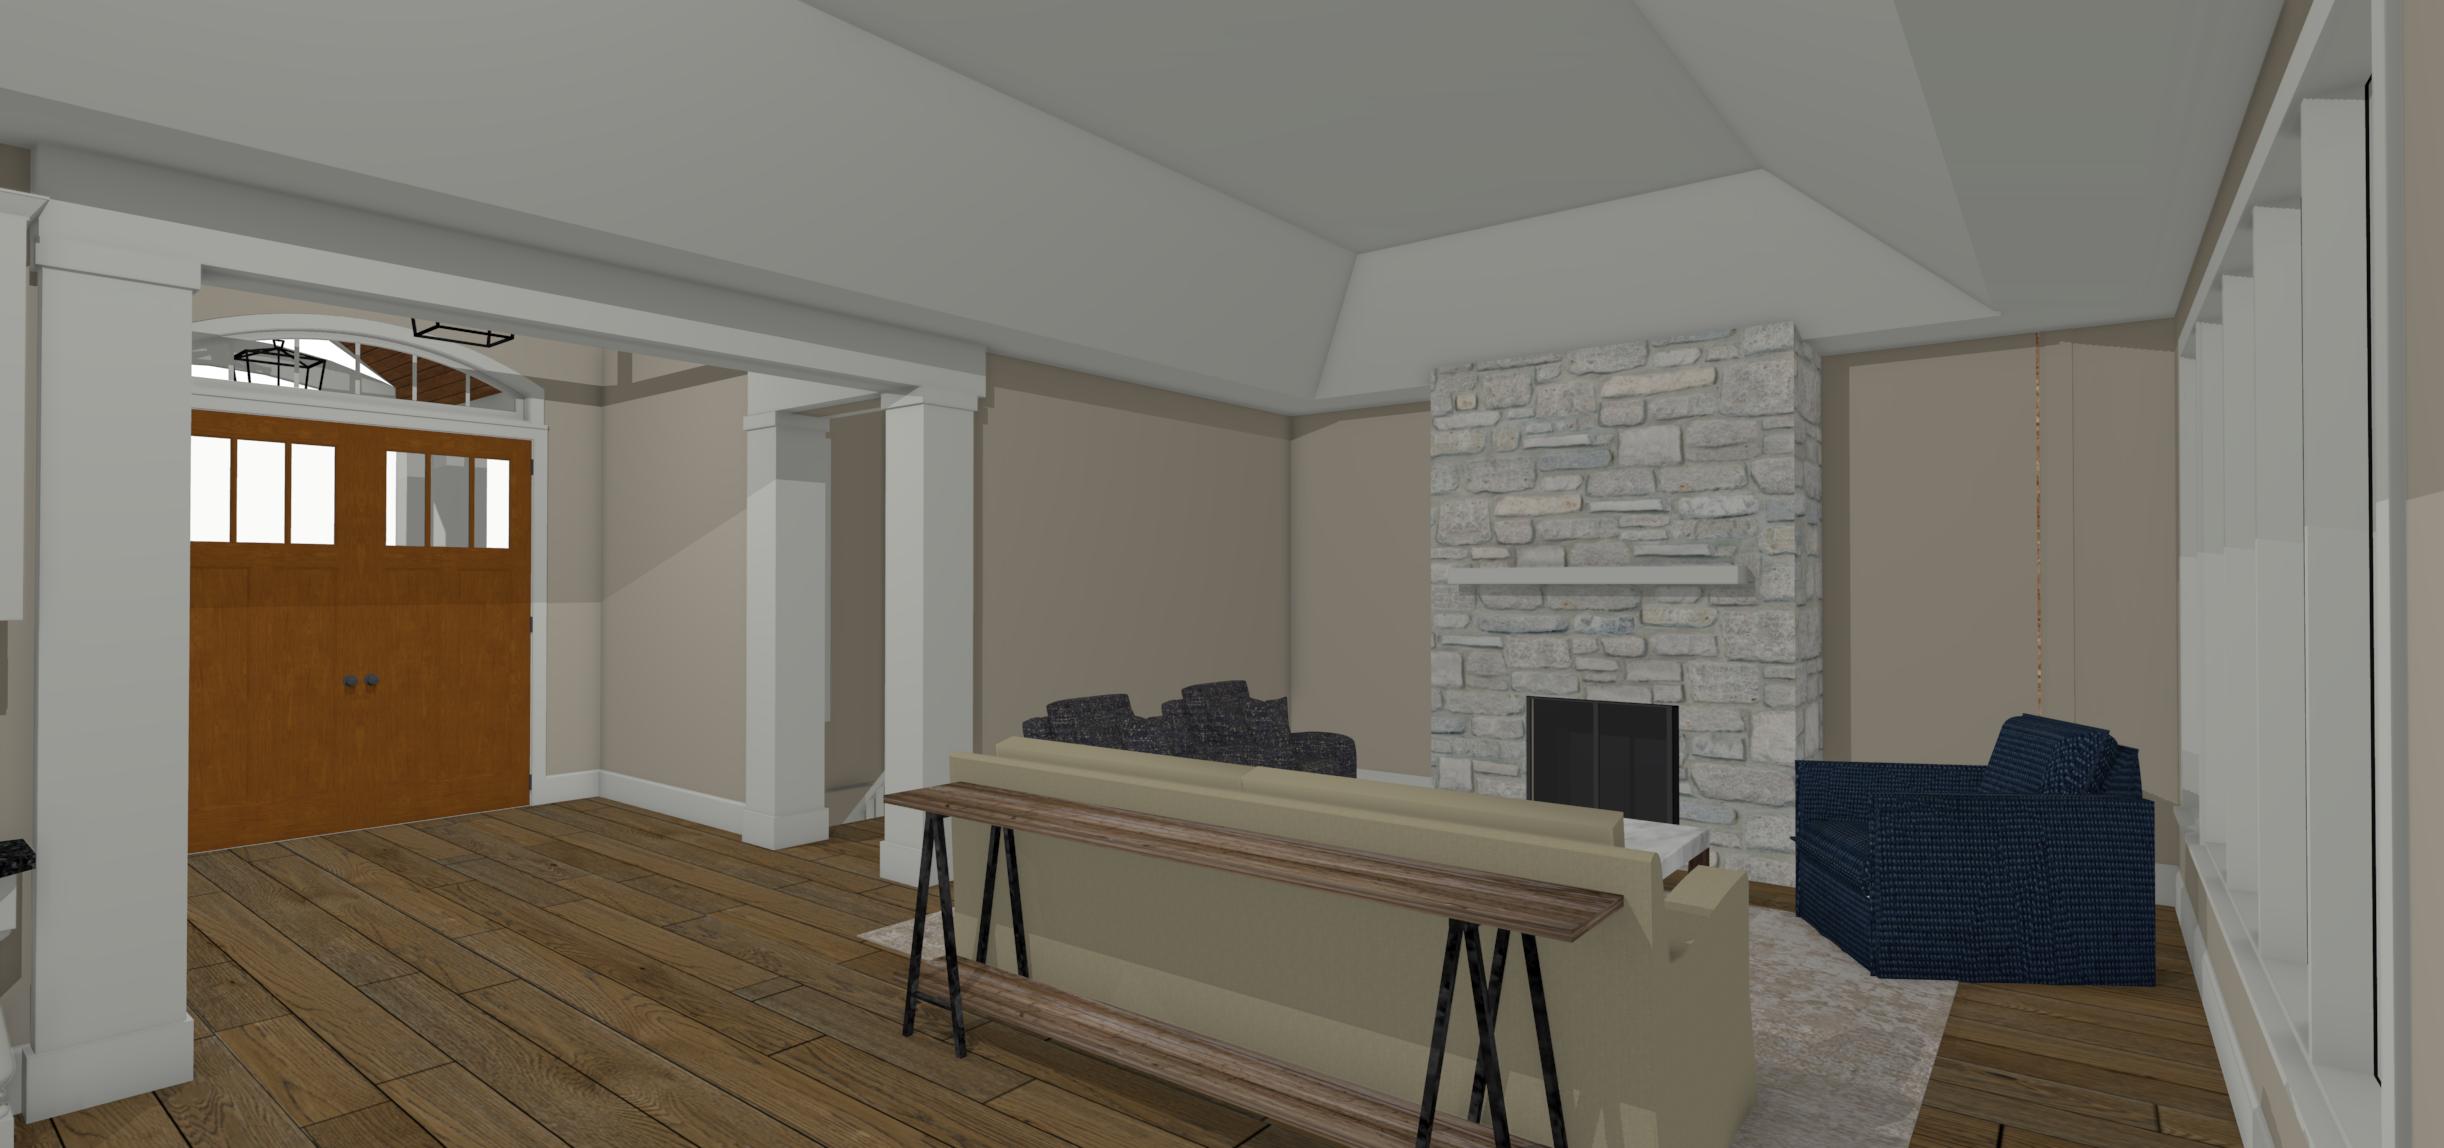 Existing Plan Living Room Design